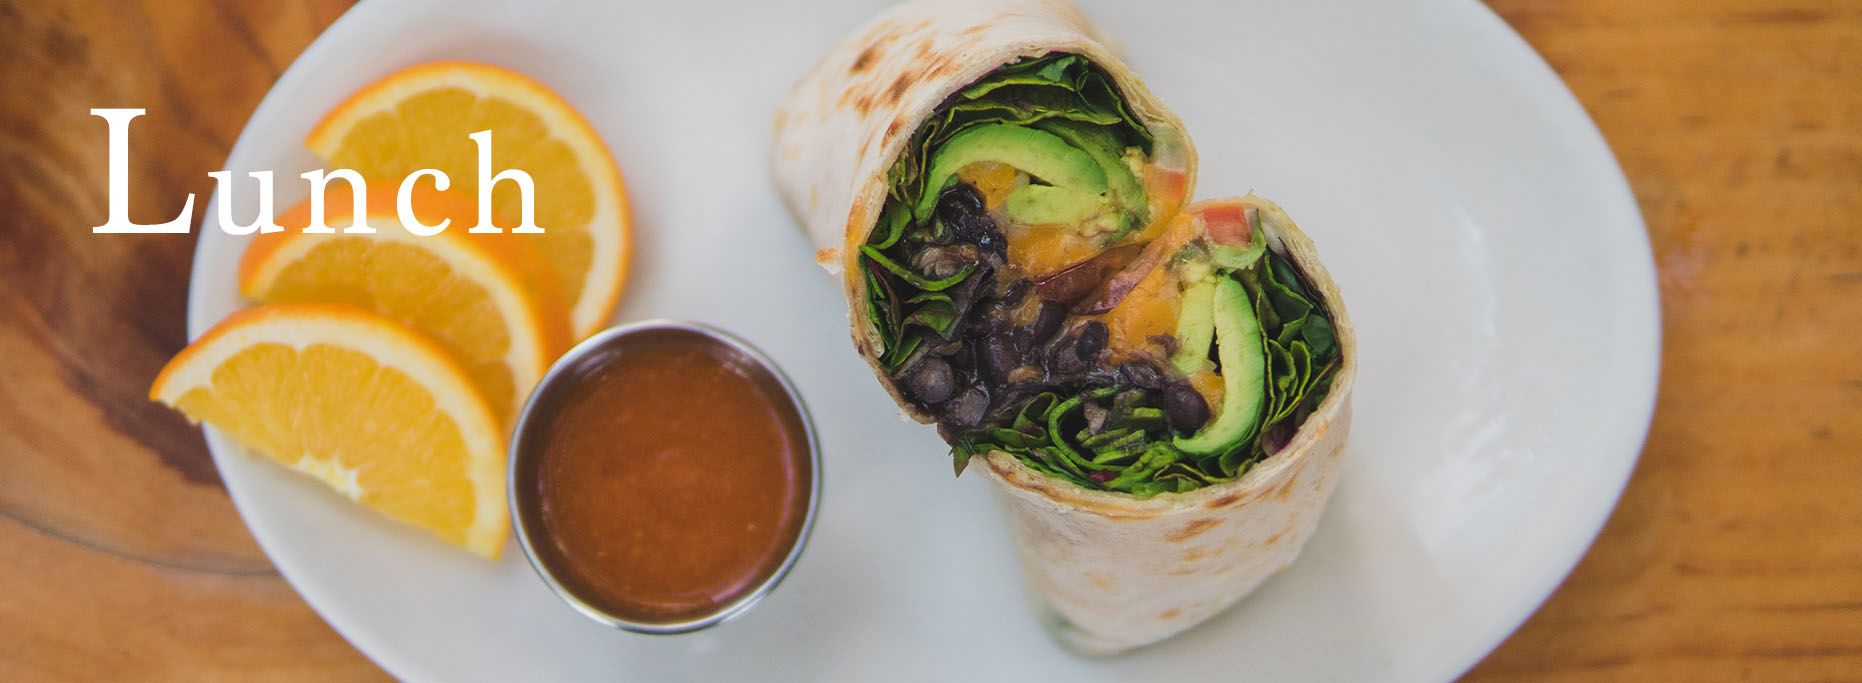 Pannikin La Jolla lunch vegetarian burrito